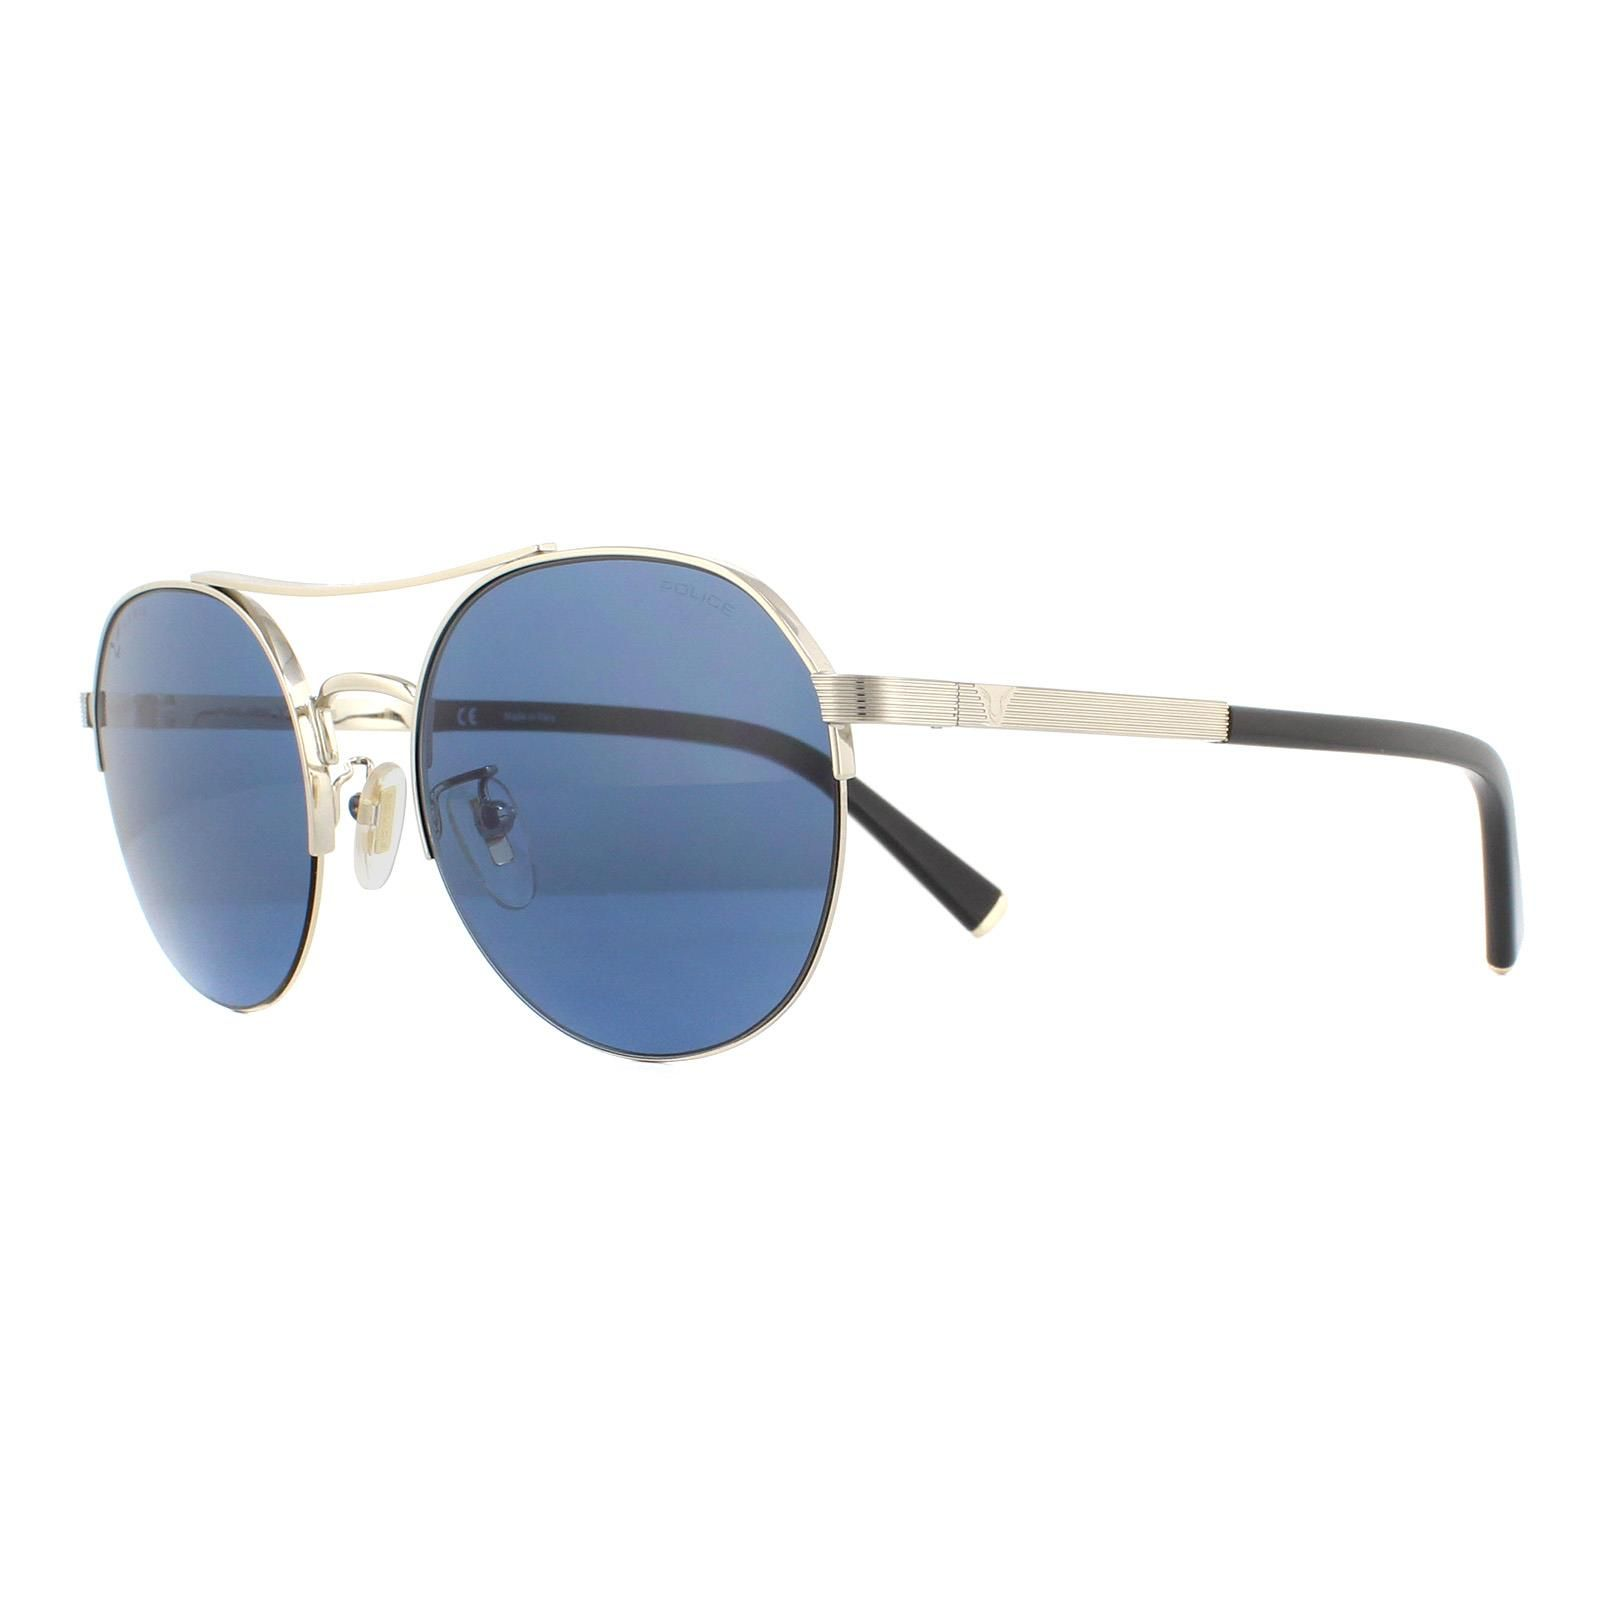 Police Sunglasses SPLA24 Lewis Hamilton 0594 Shiny Gold Blue